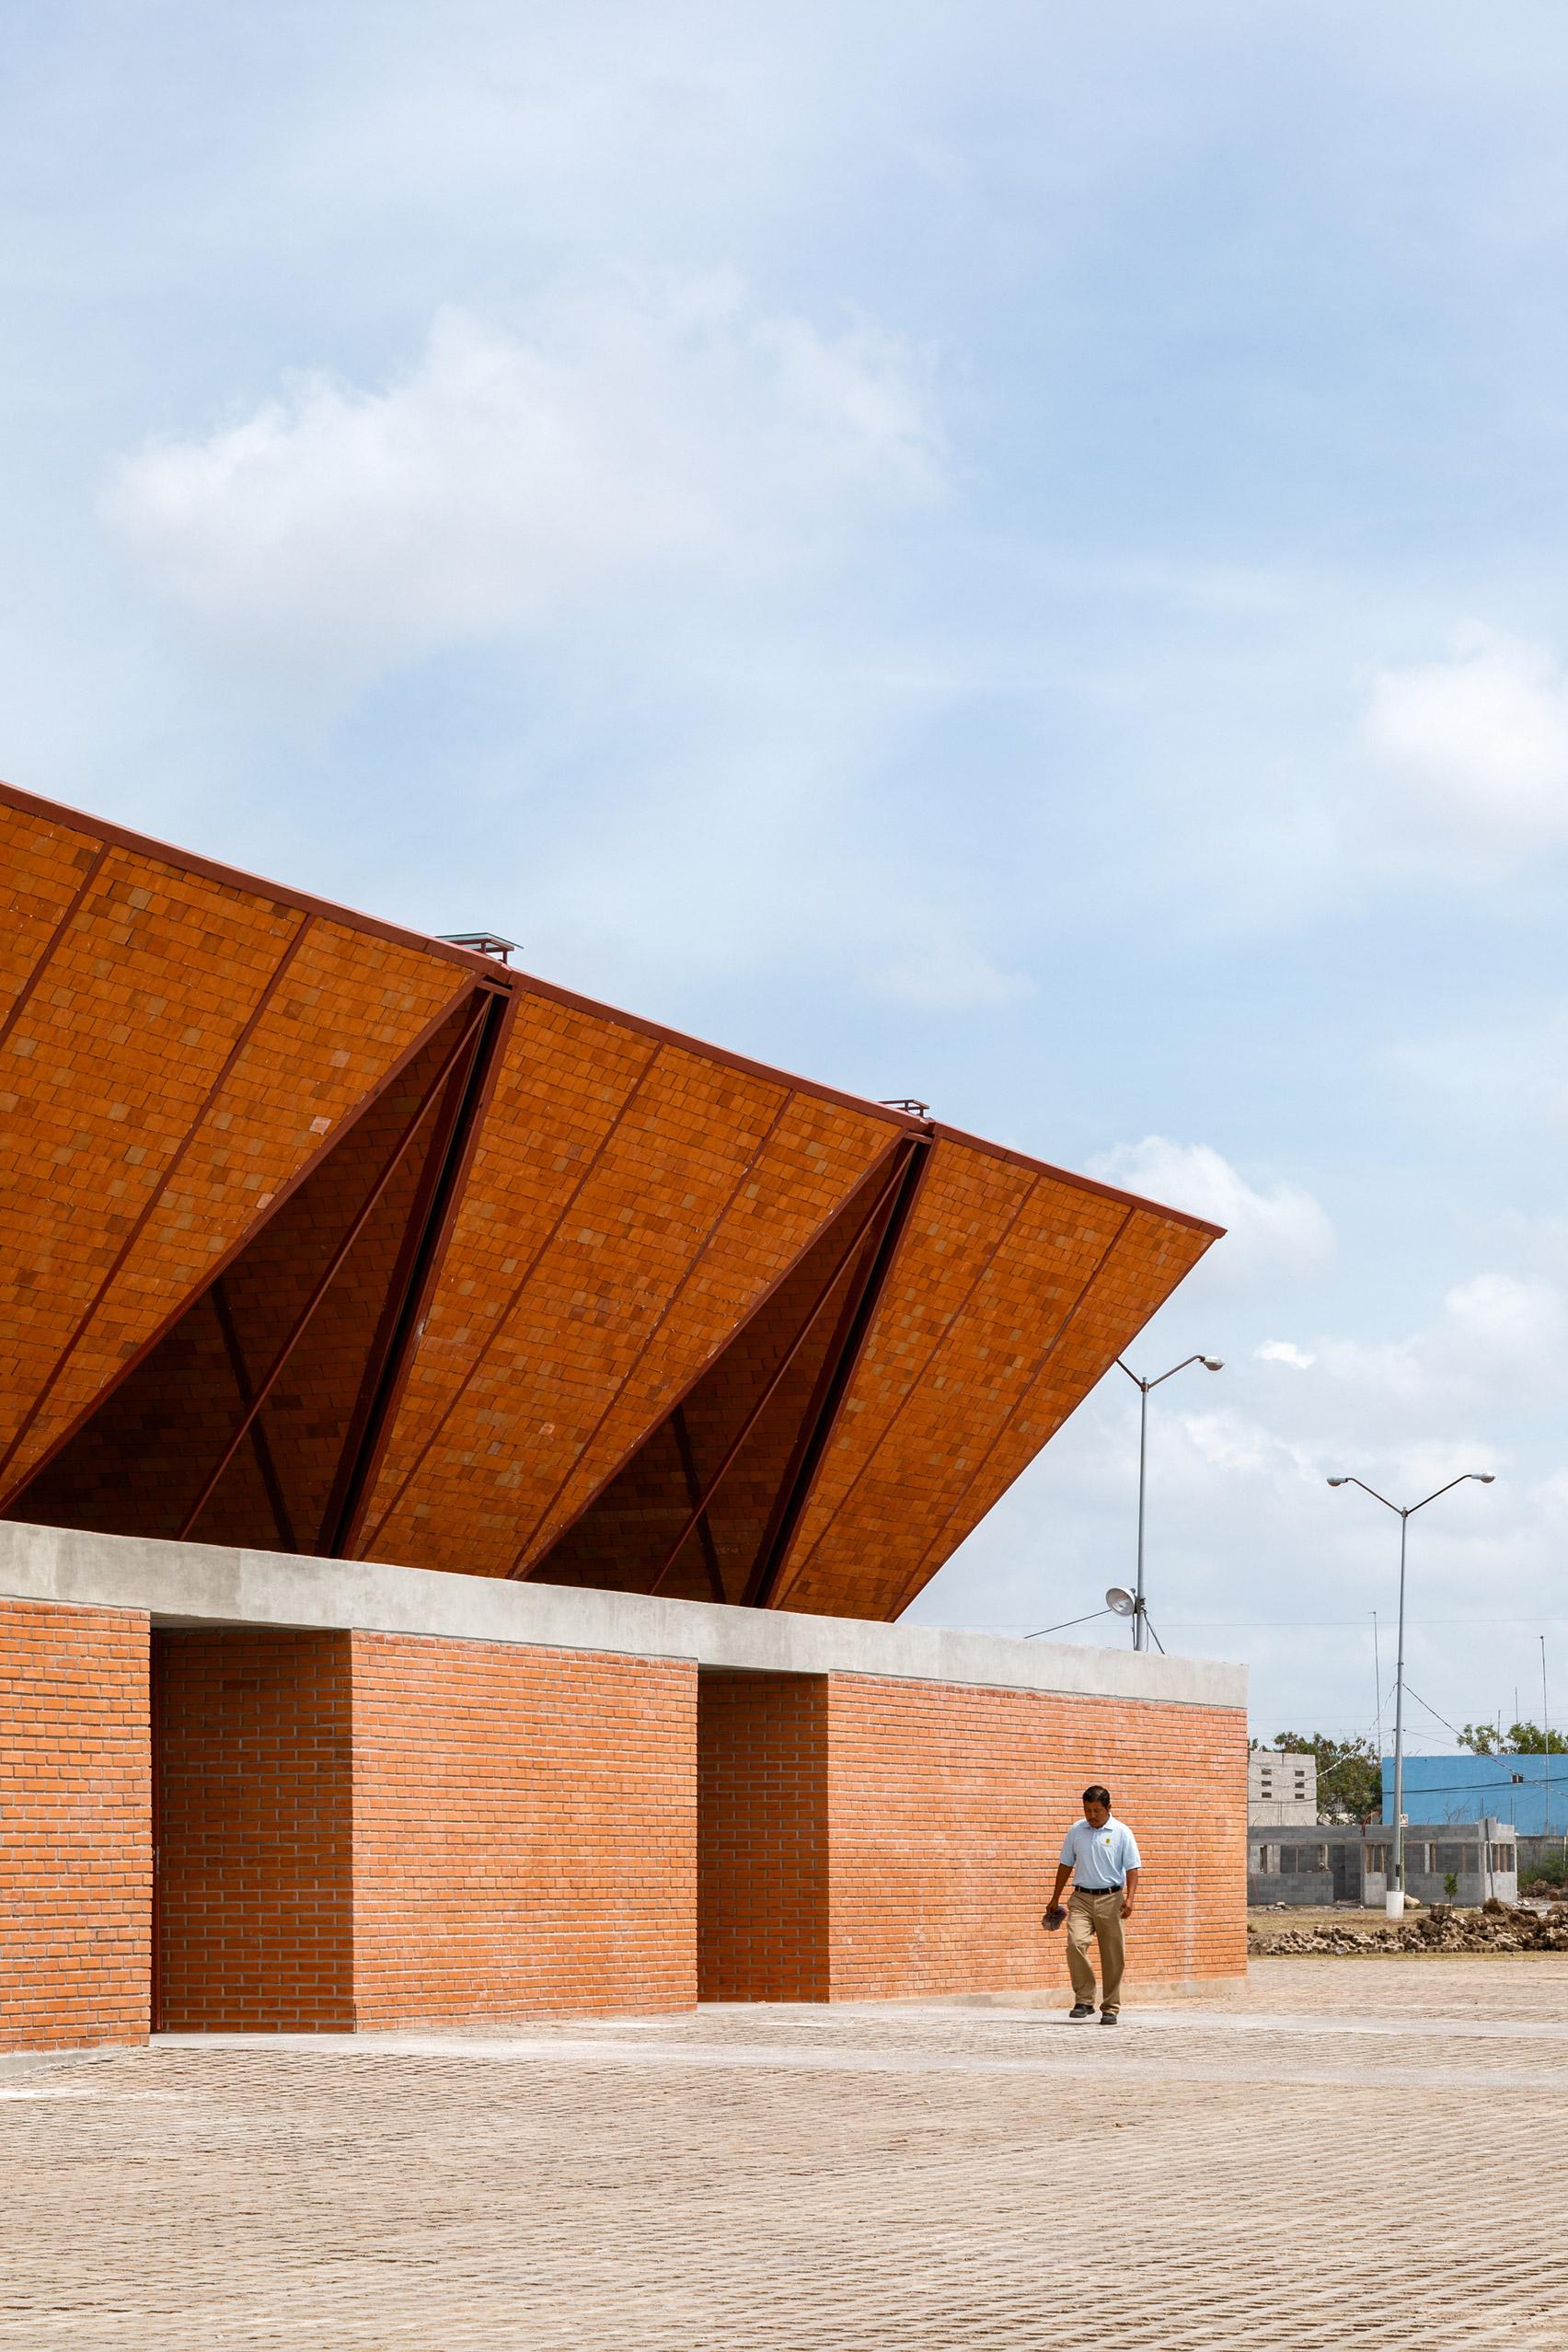 Market in Mexico made of bricks